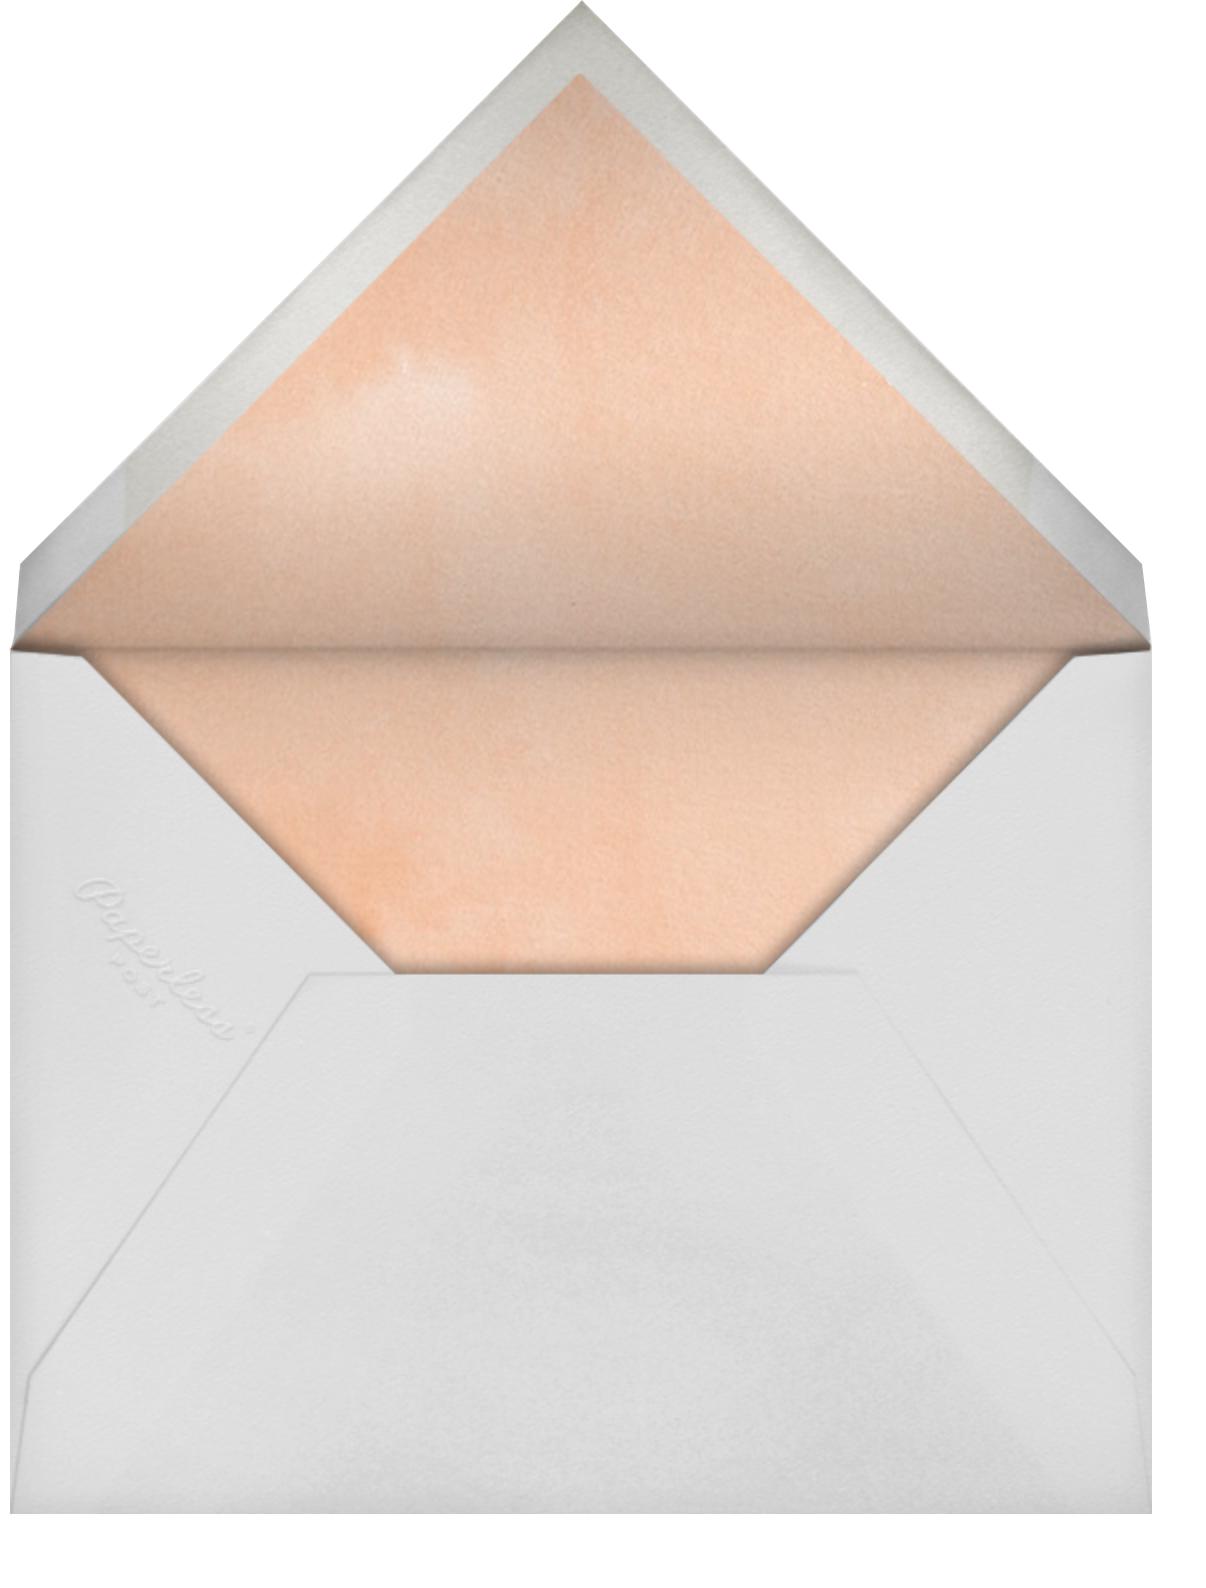 Our Little Kin - Paperless Post - Envelope